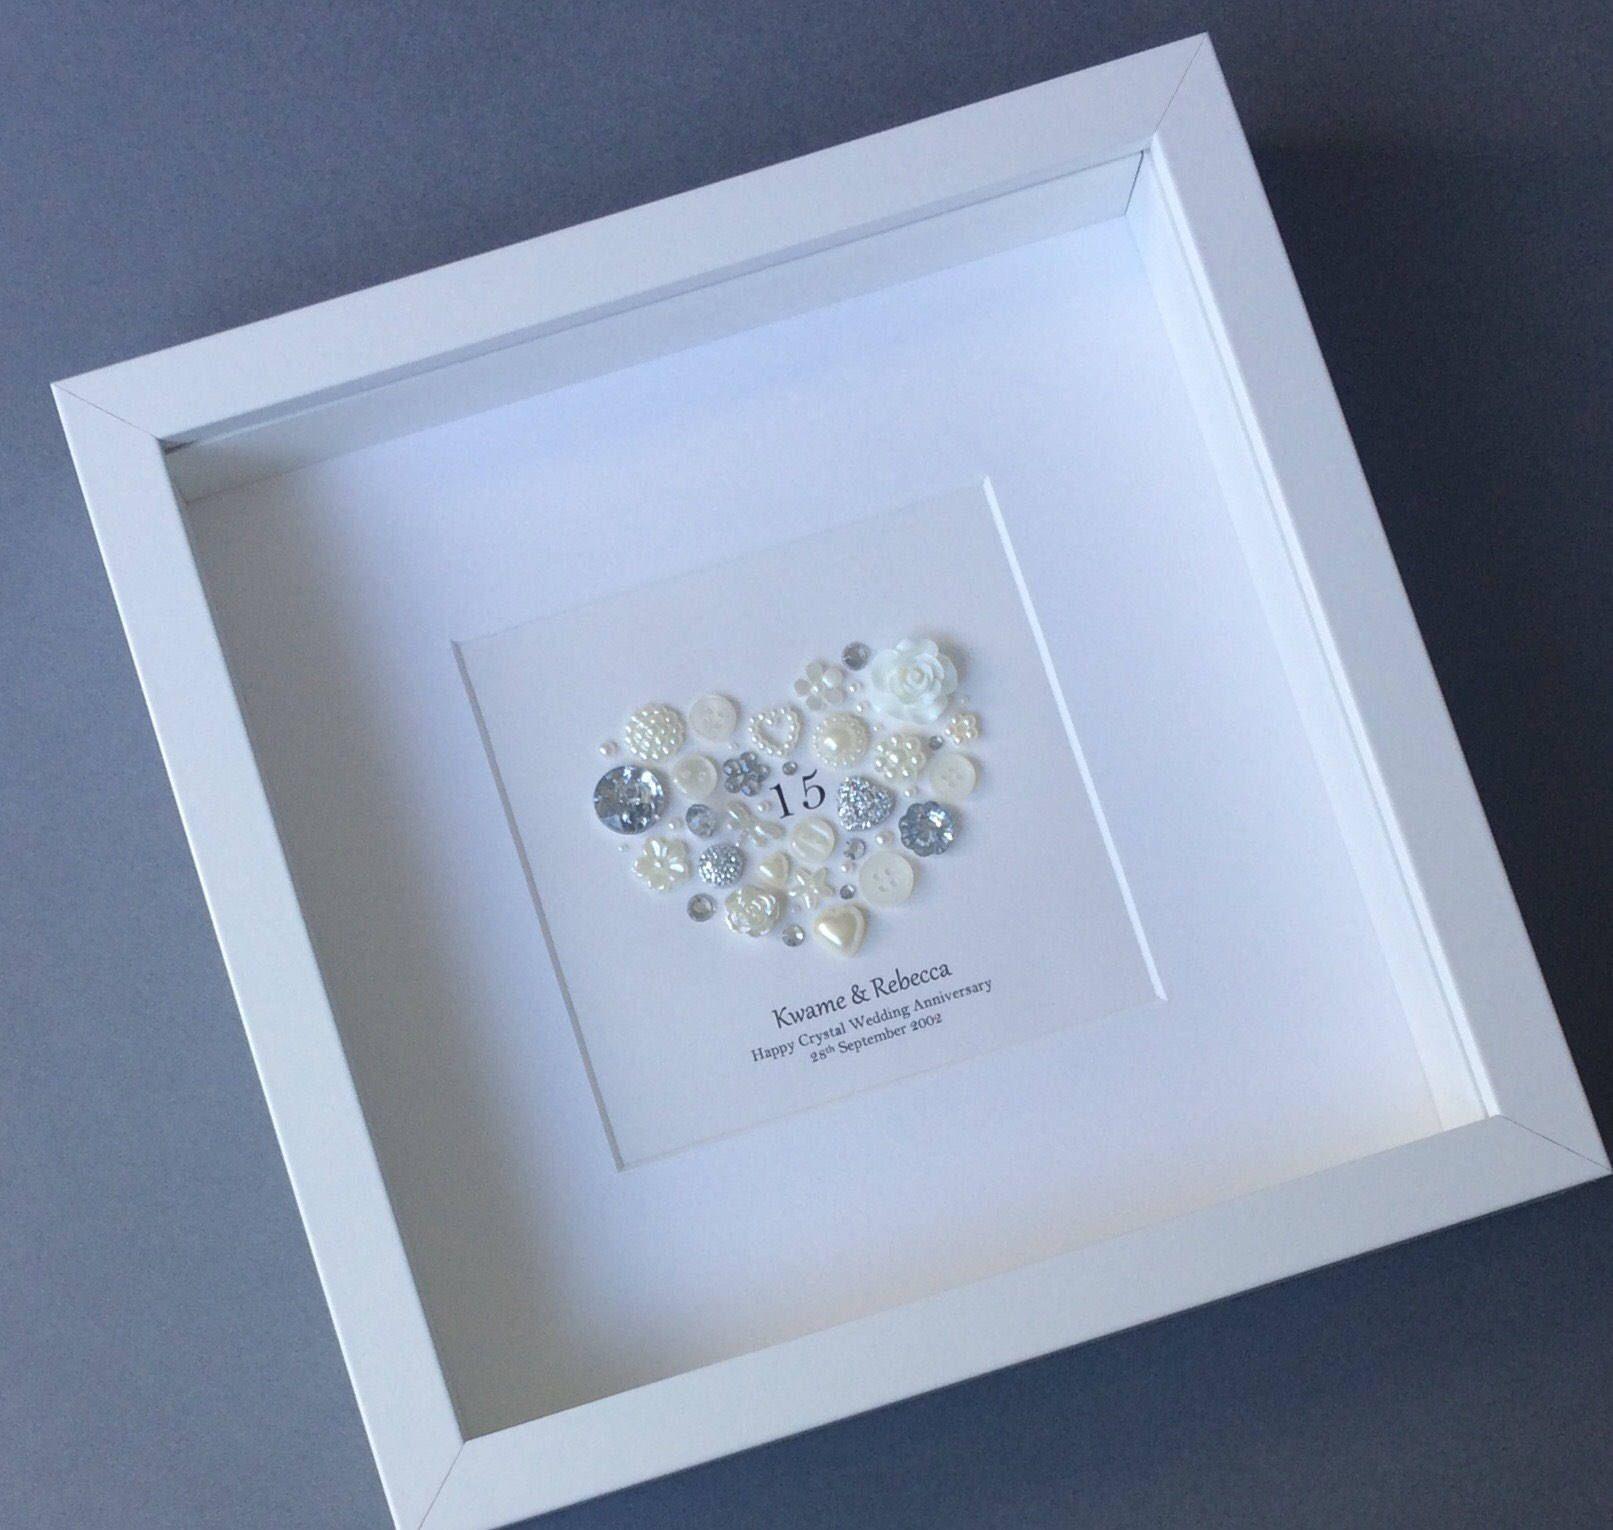 15th wedding anniversary gift crystal anniversary frame